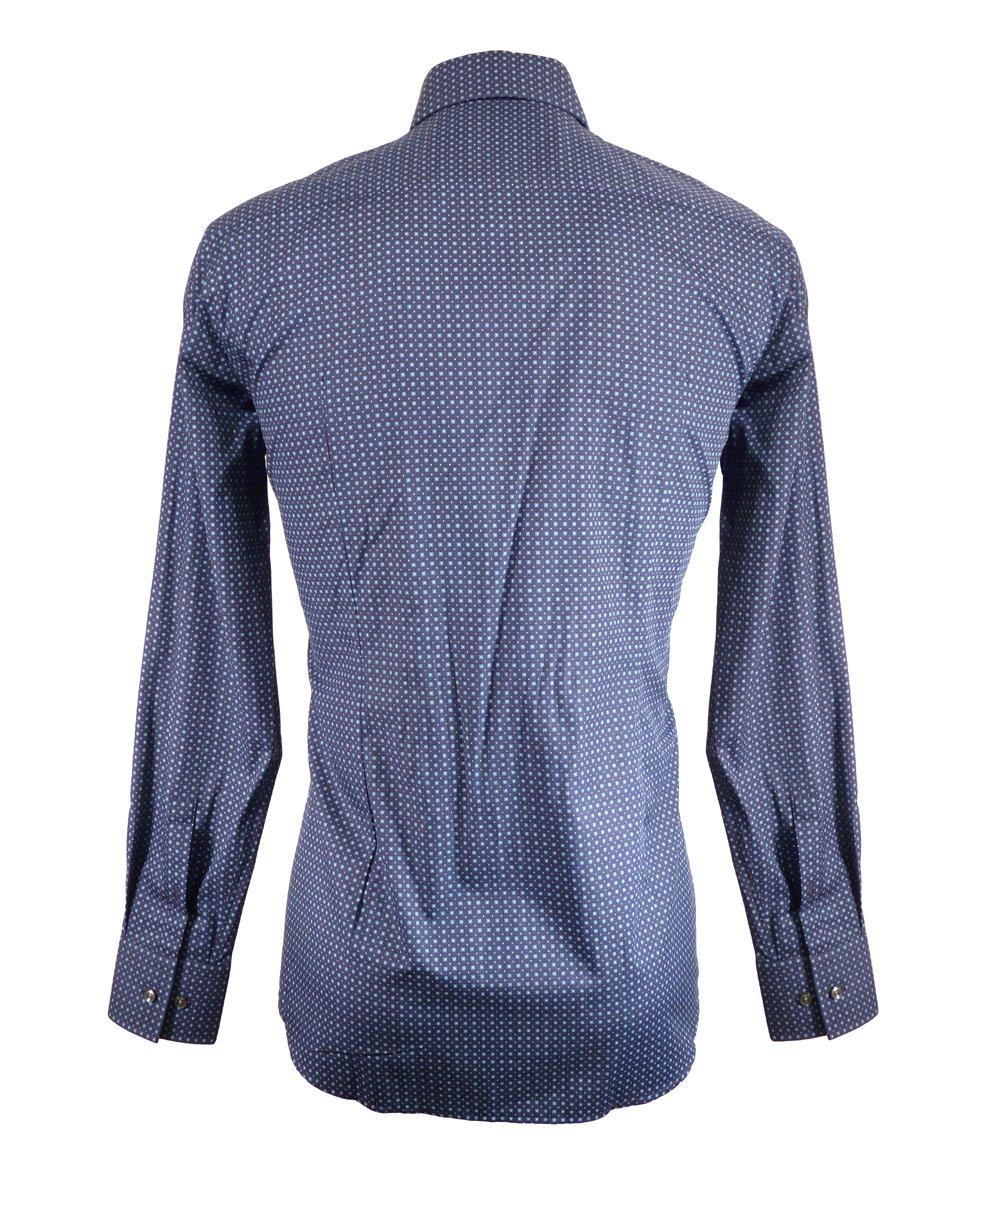 Hugo boss navy with blue square pattern jaron shirt hugo for Hugo boss navy shirt